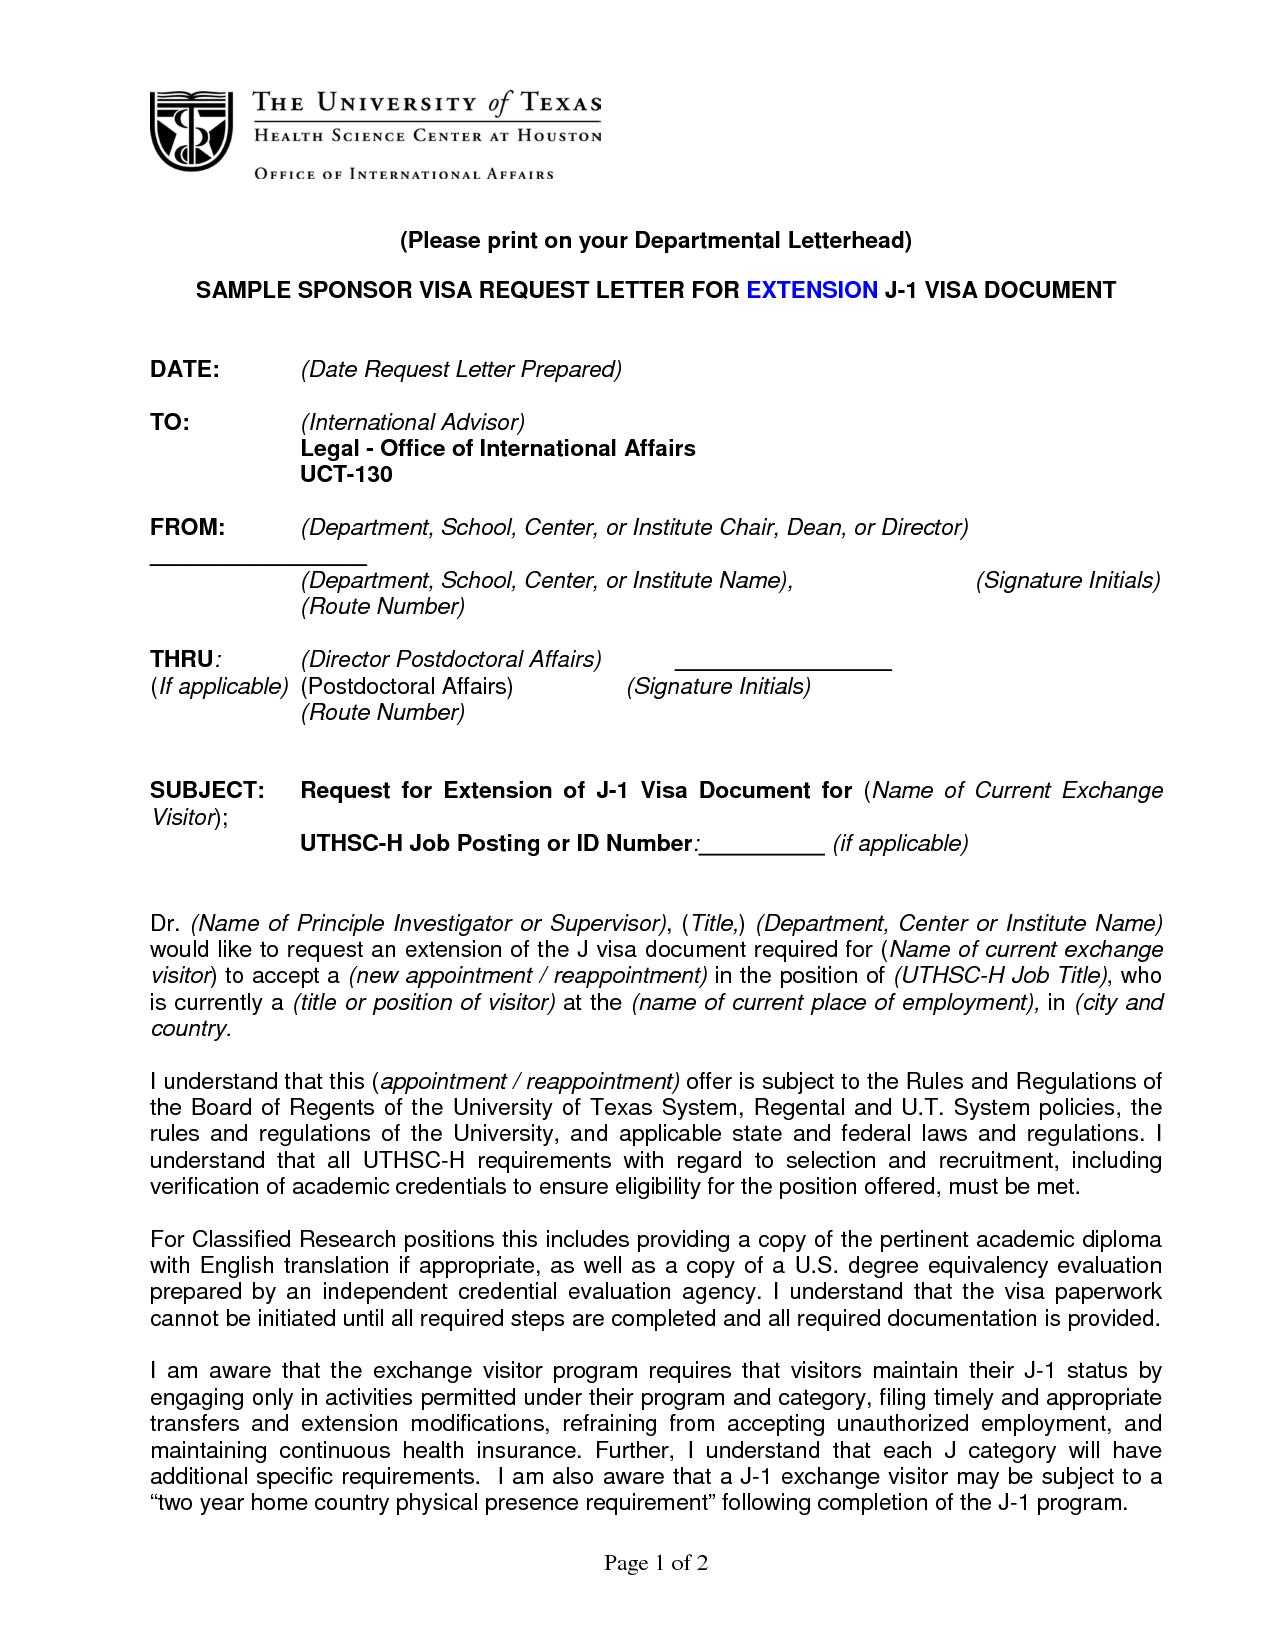 Ergonomic Chair Request Letter Outdoor Furniture Hanging Egg Invitation For Visa Montgomery Ward Credit Cardvisa